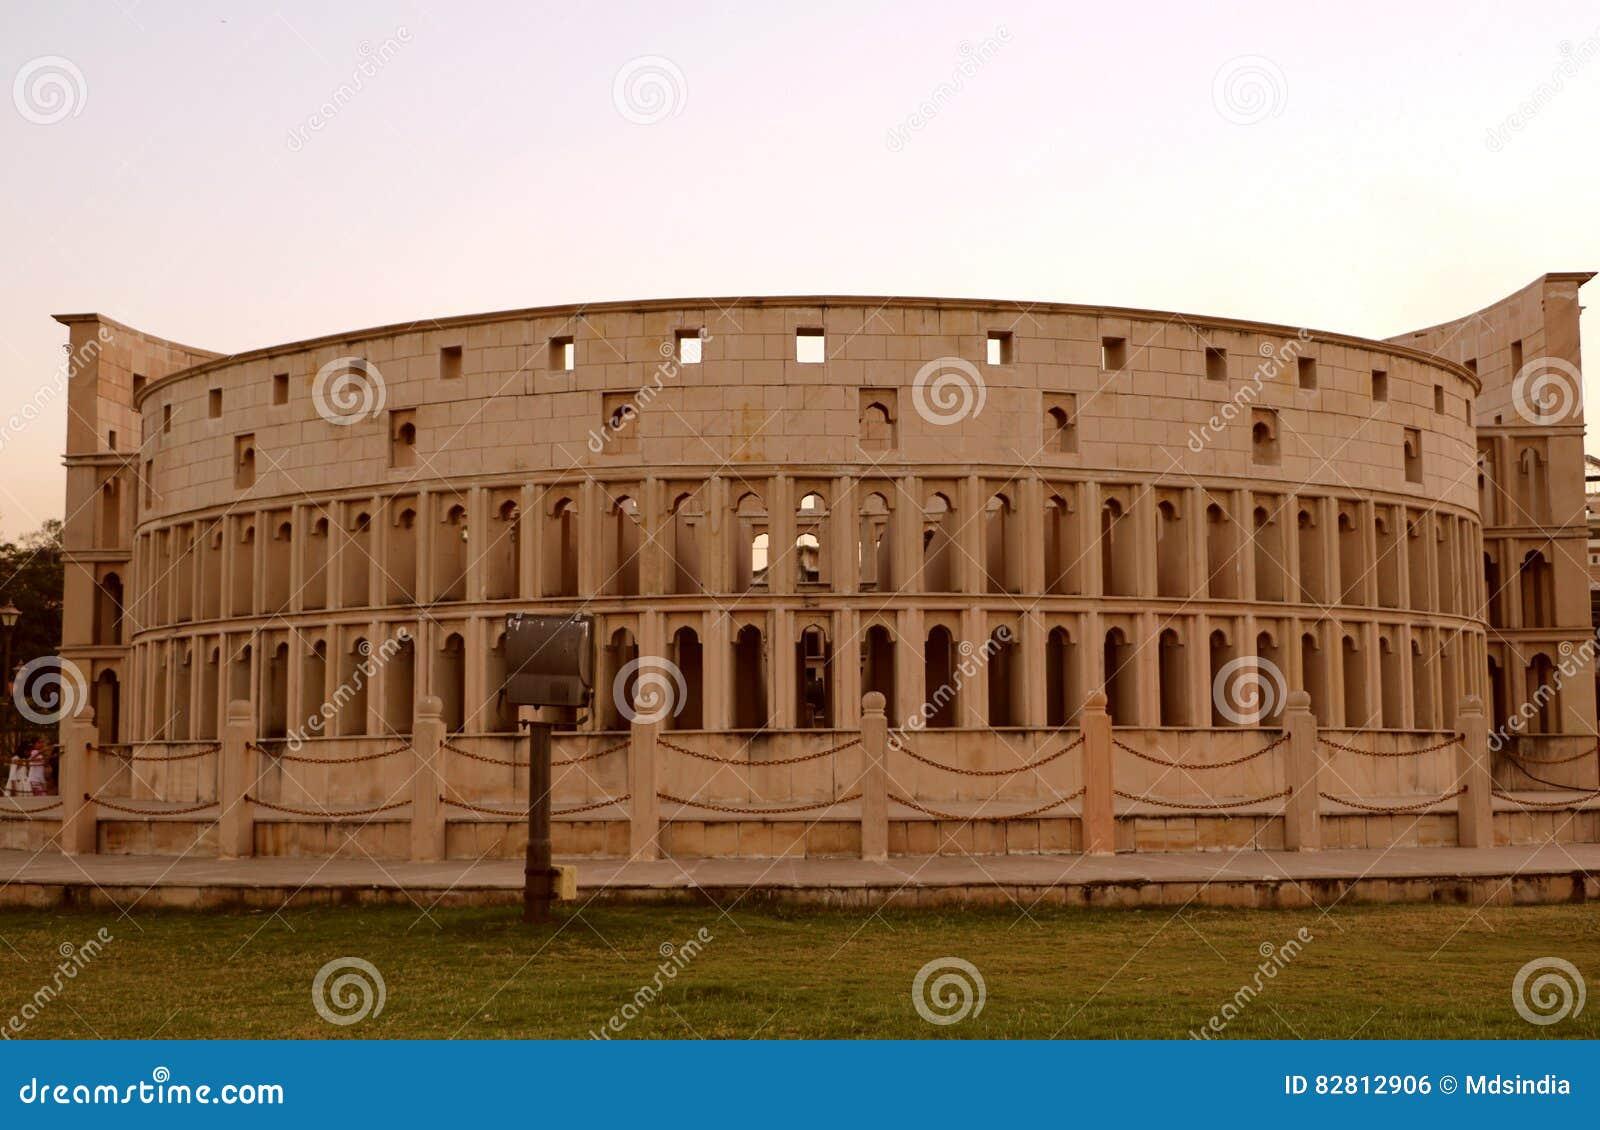 Die Replik von Rom-` s Colosseum